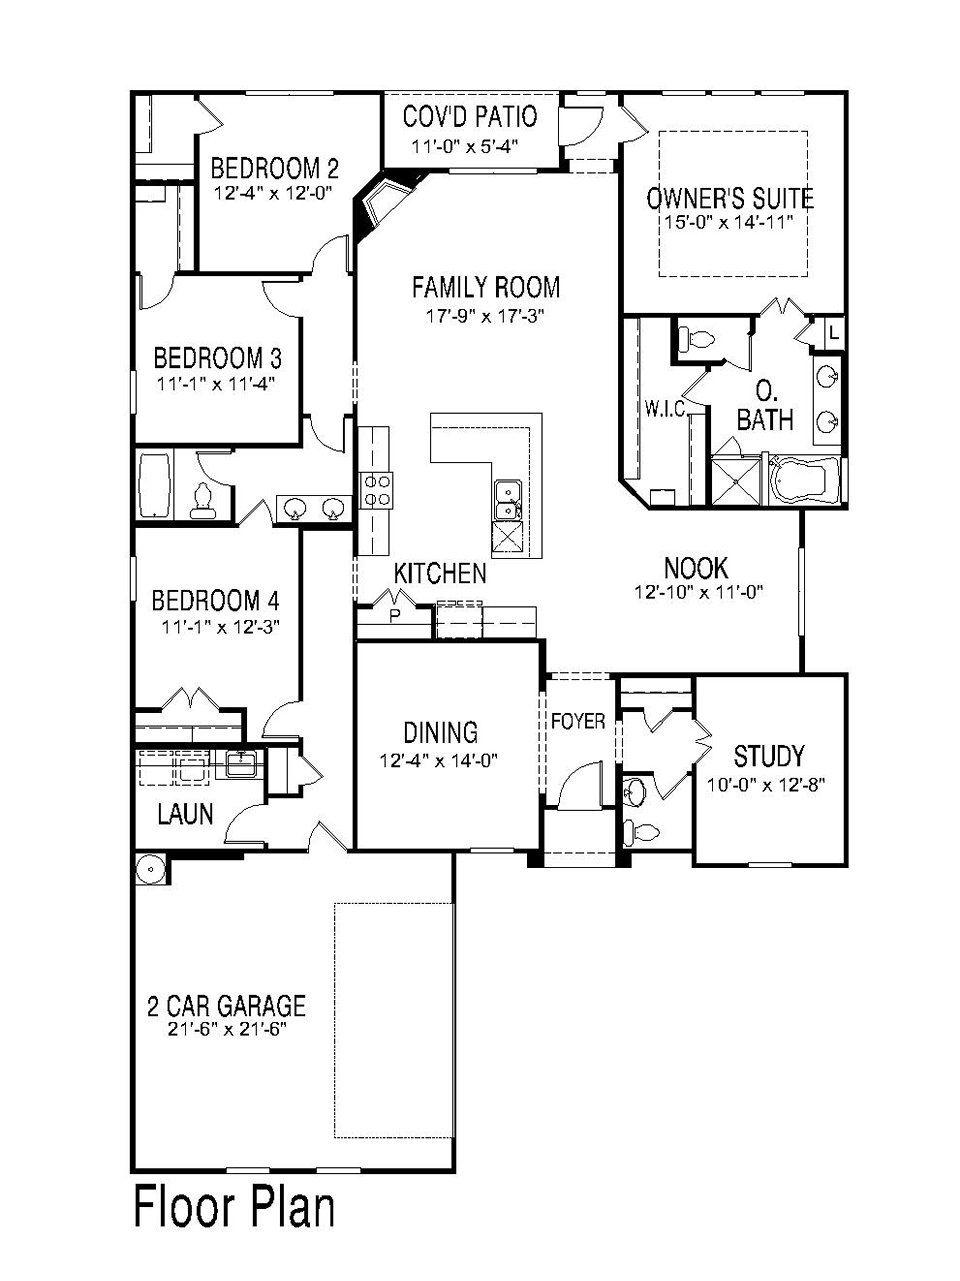 Room Floor Plan Designer Free: 1 Story, 4 Bed/2.5 Bath